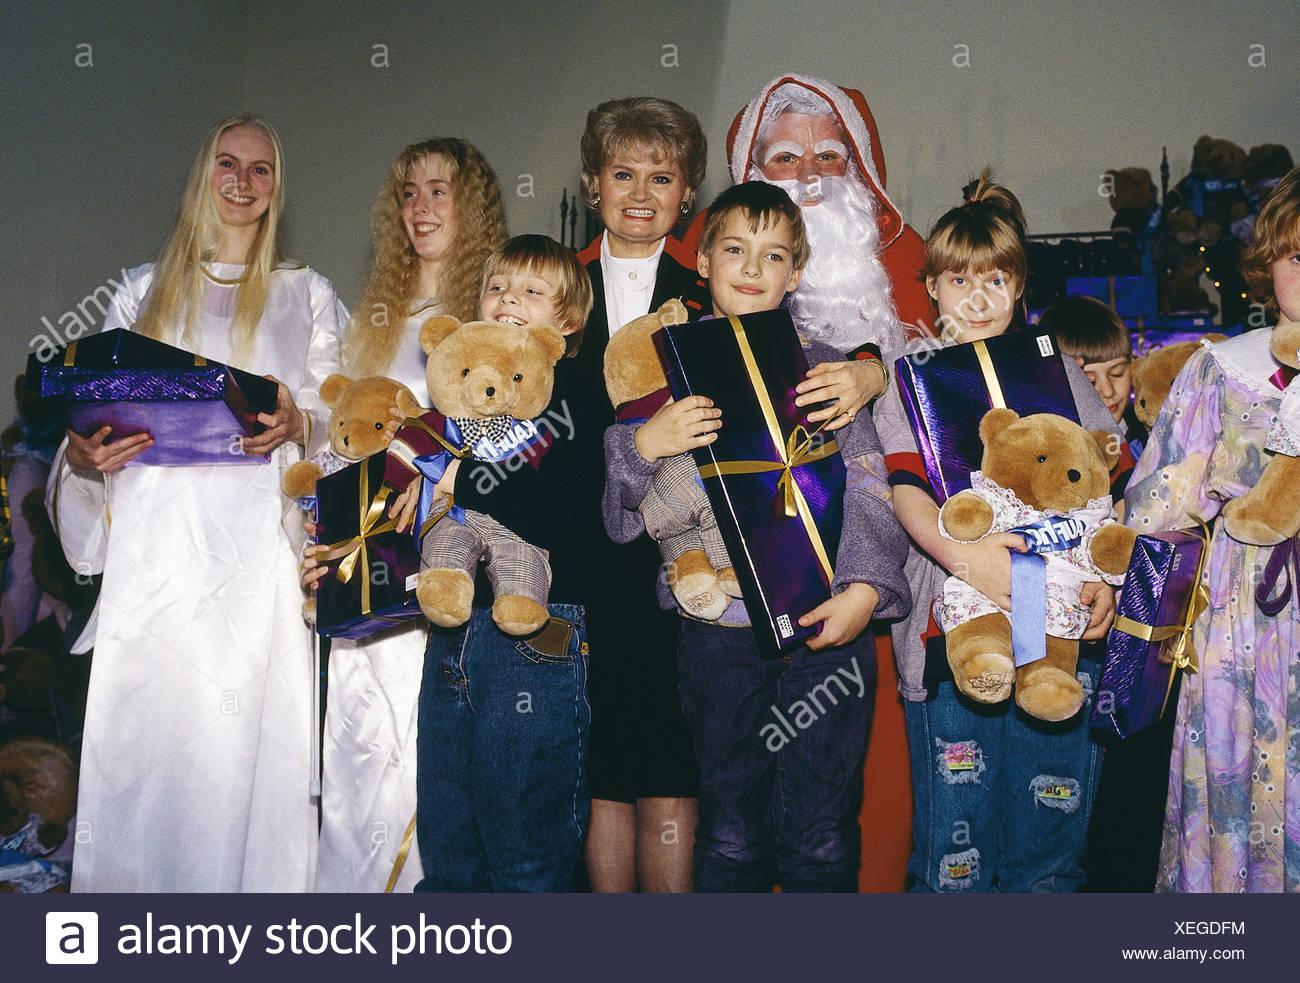 Kohl, Helmut, * 3.4.1930, German politician (CDU), his wife Hannelore, half length, on advent celebration in children hospital W Stockbild